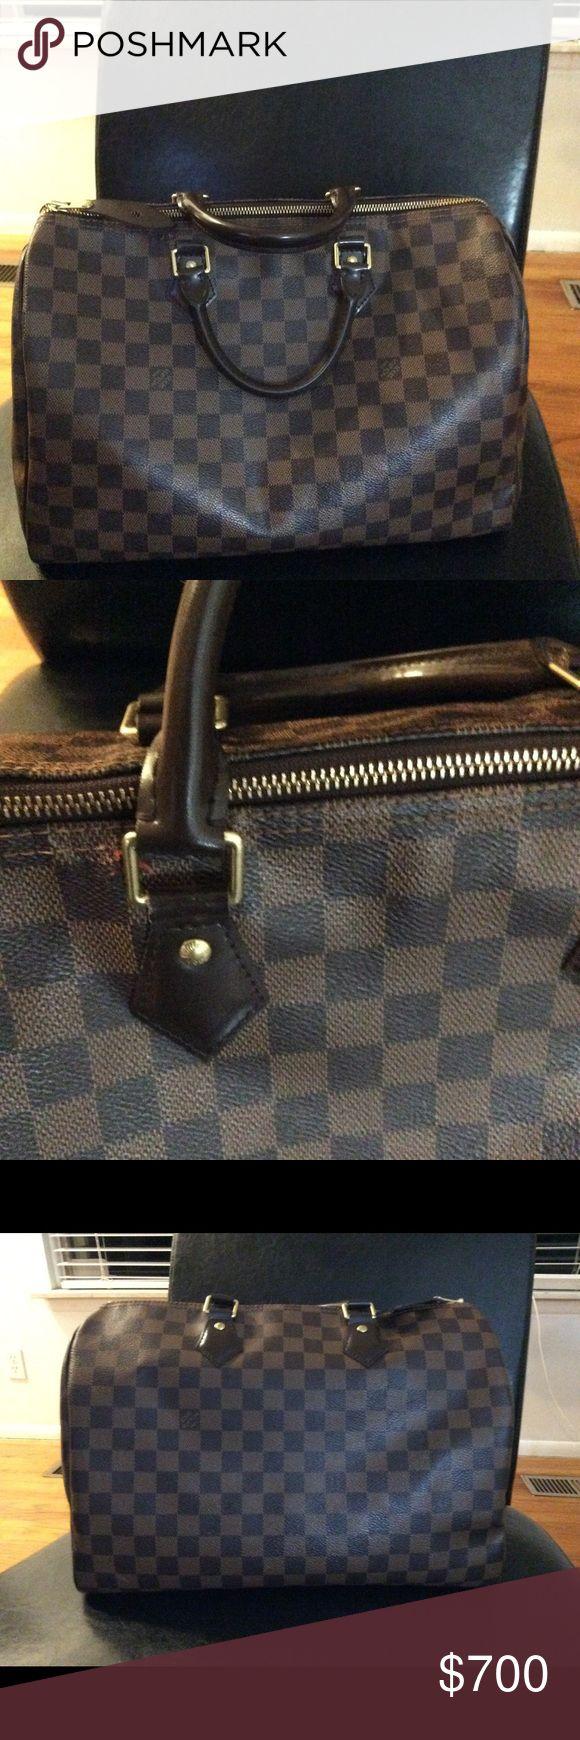 Louis Vuitton speedy bag 35 2 yr old Louis Vuitton satchel. Have original packaging and receipt. Louis Vuitton Bags Satchels